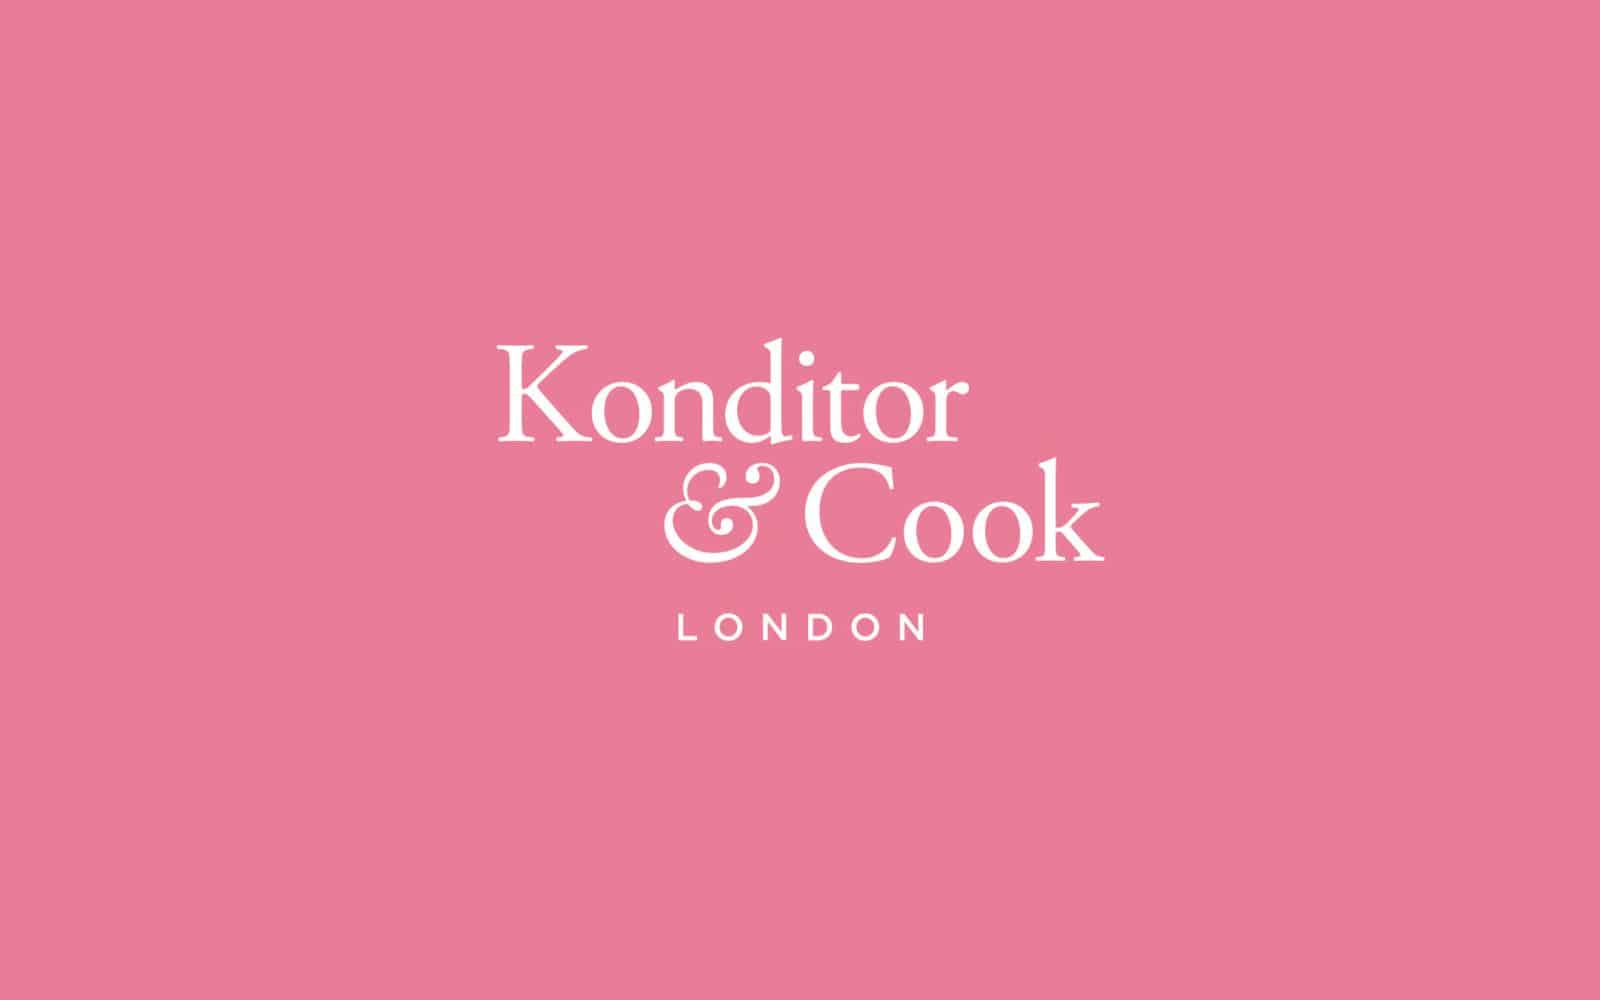 ka_web_sbr_konditor_cook